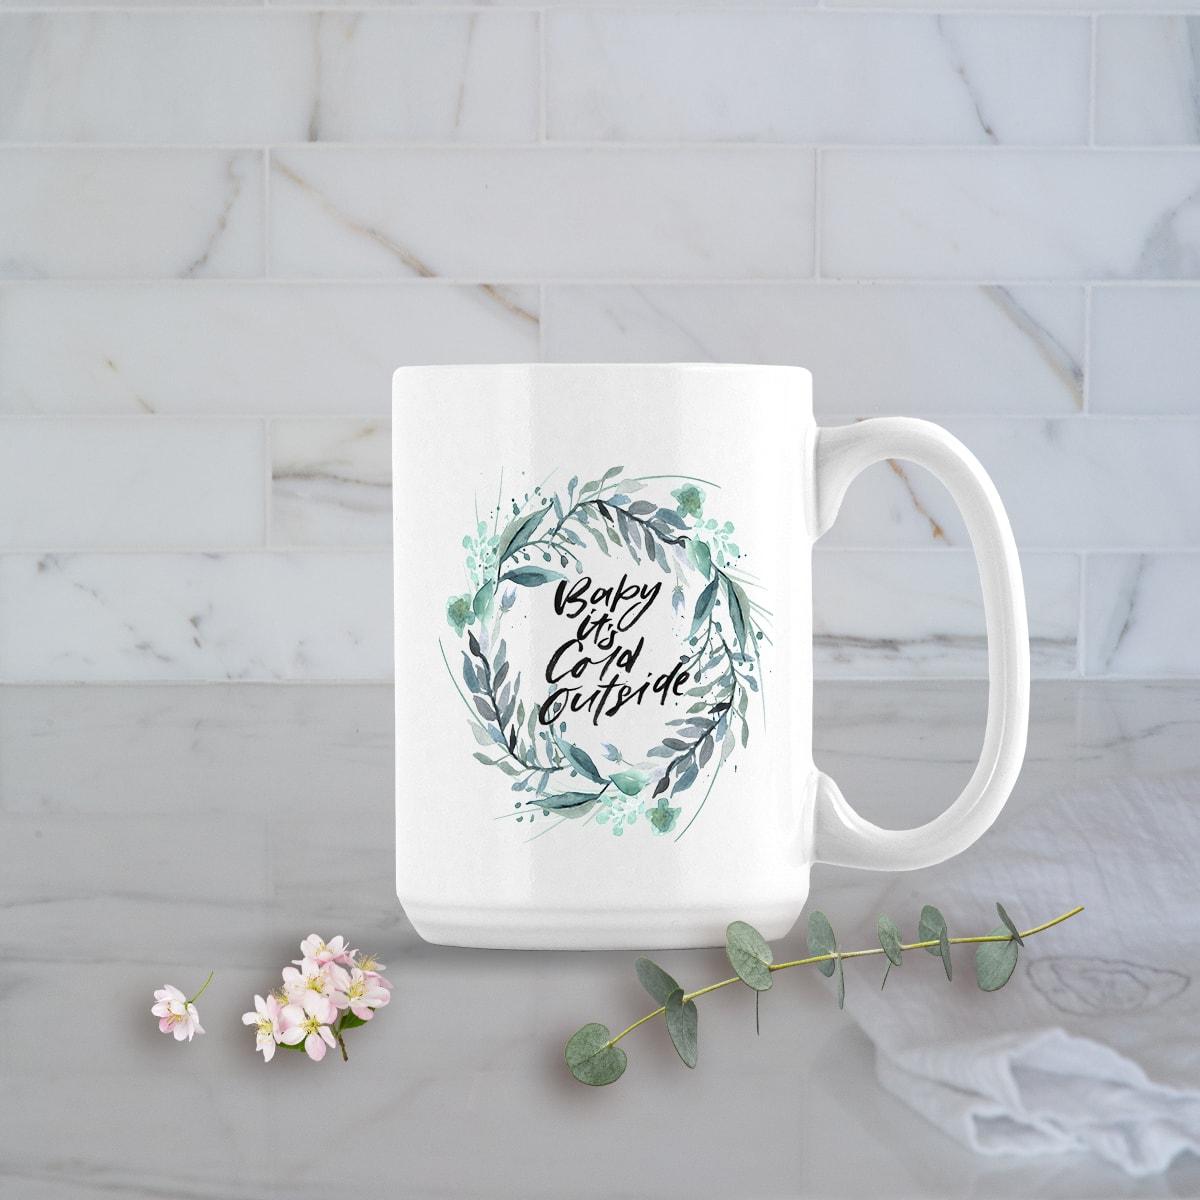 Posh Cottage Shop Winter 19 Baby It's Cold white 15oz mug